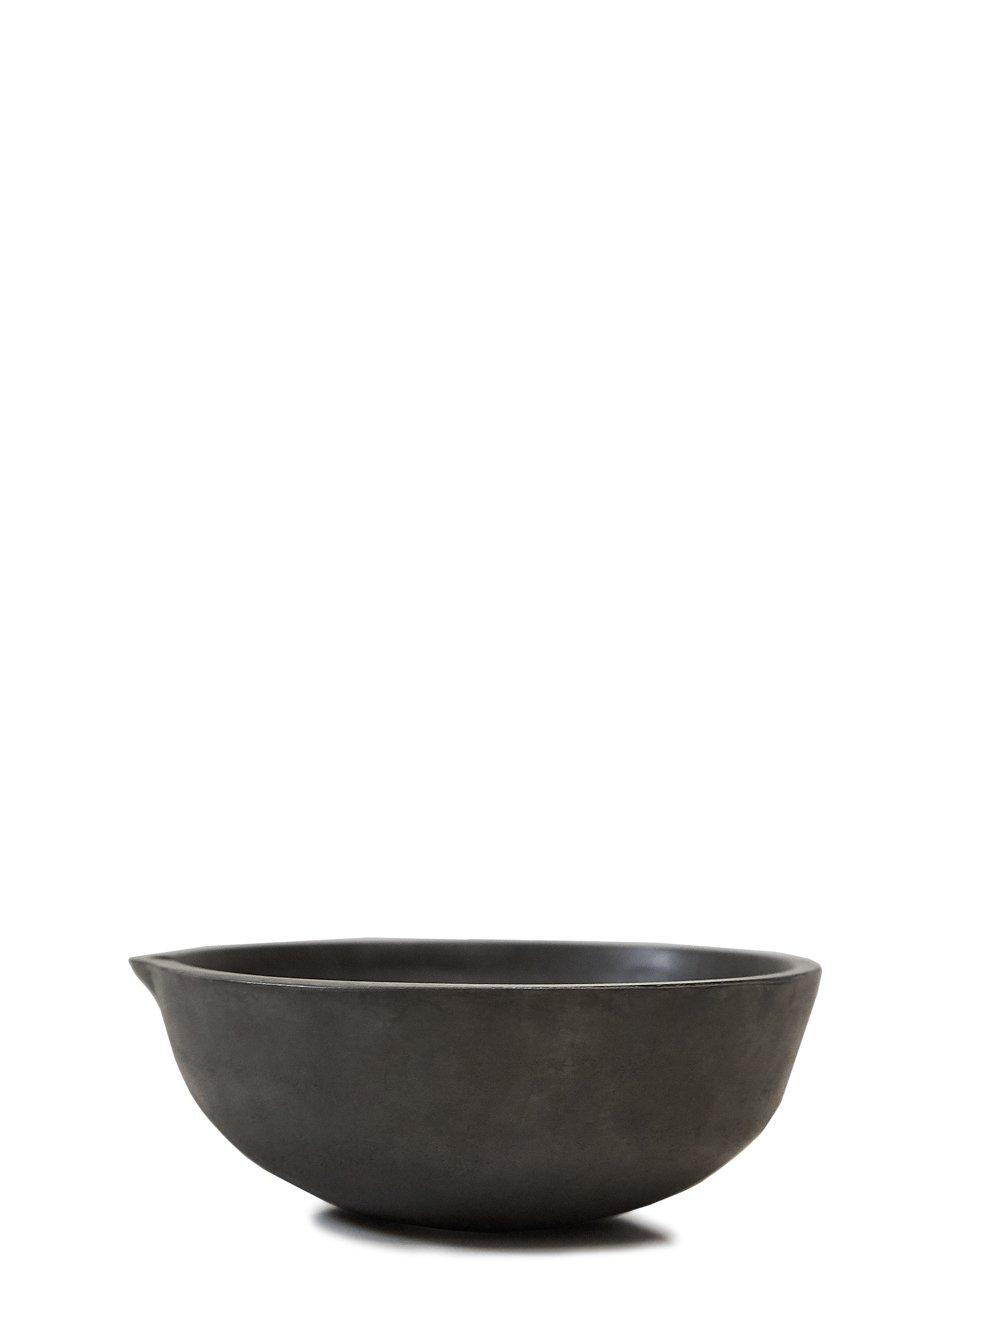 Original bowl nitrite d'argent 4100